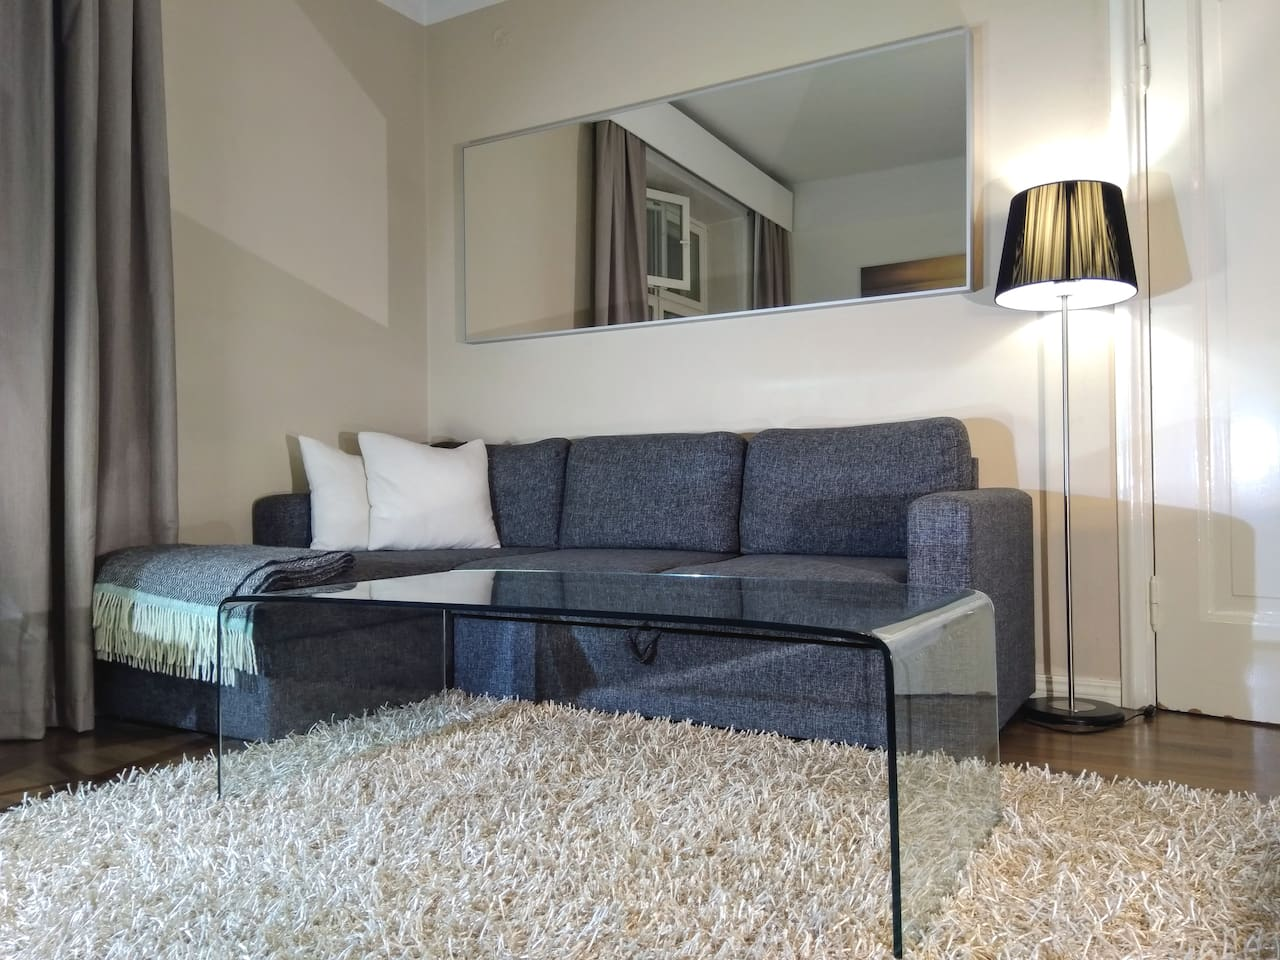 Bed sofa nr 1